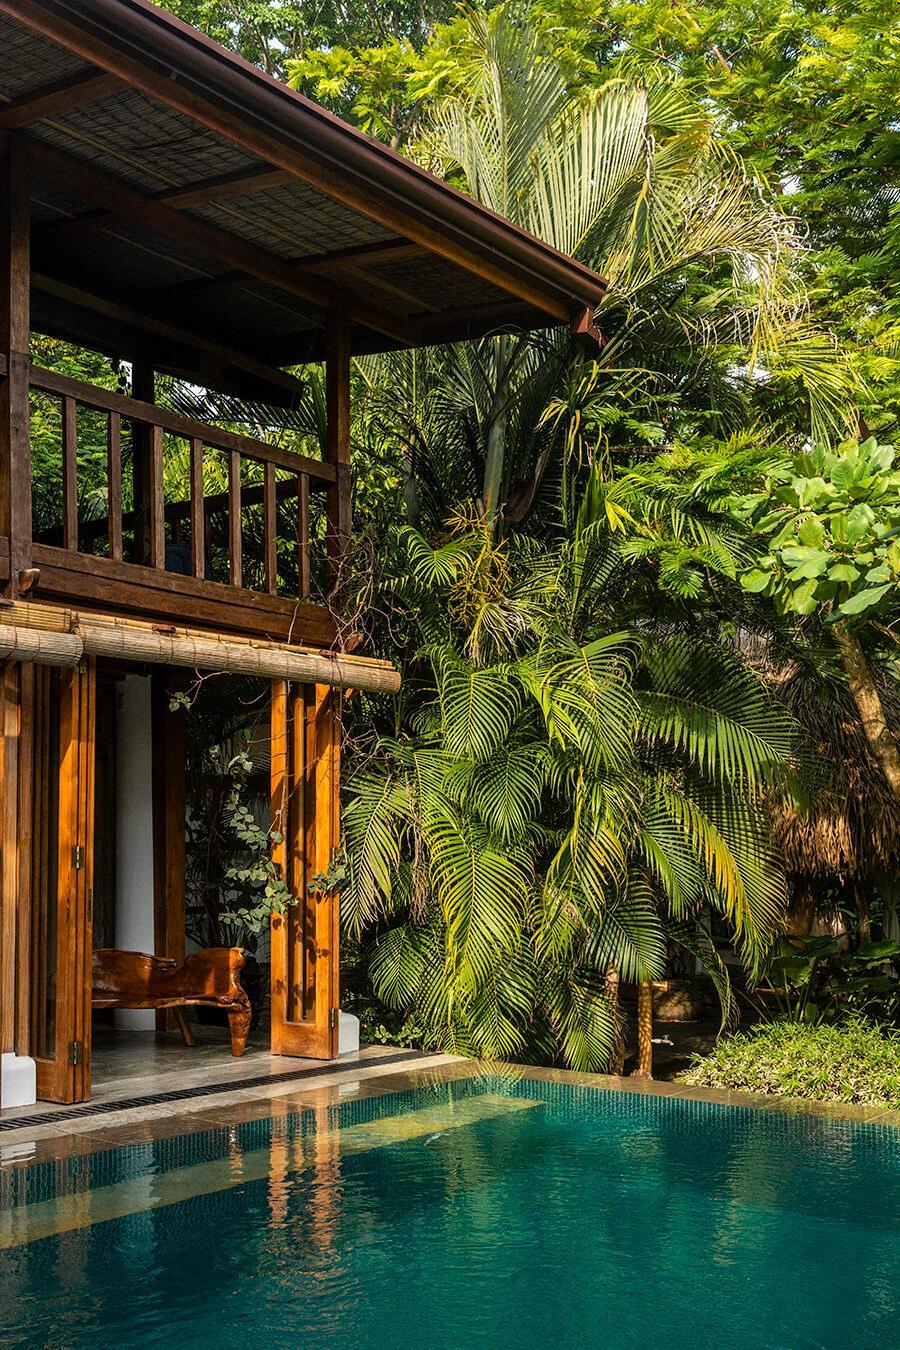 Home in Costa Rica in 2020 | Tropical garden design, Costa ...